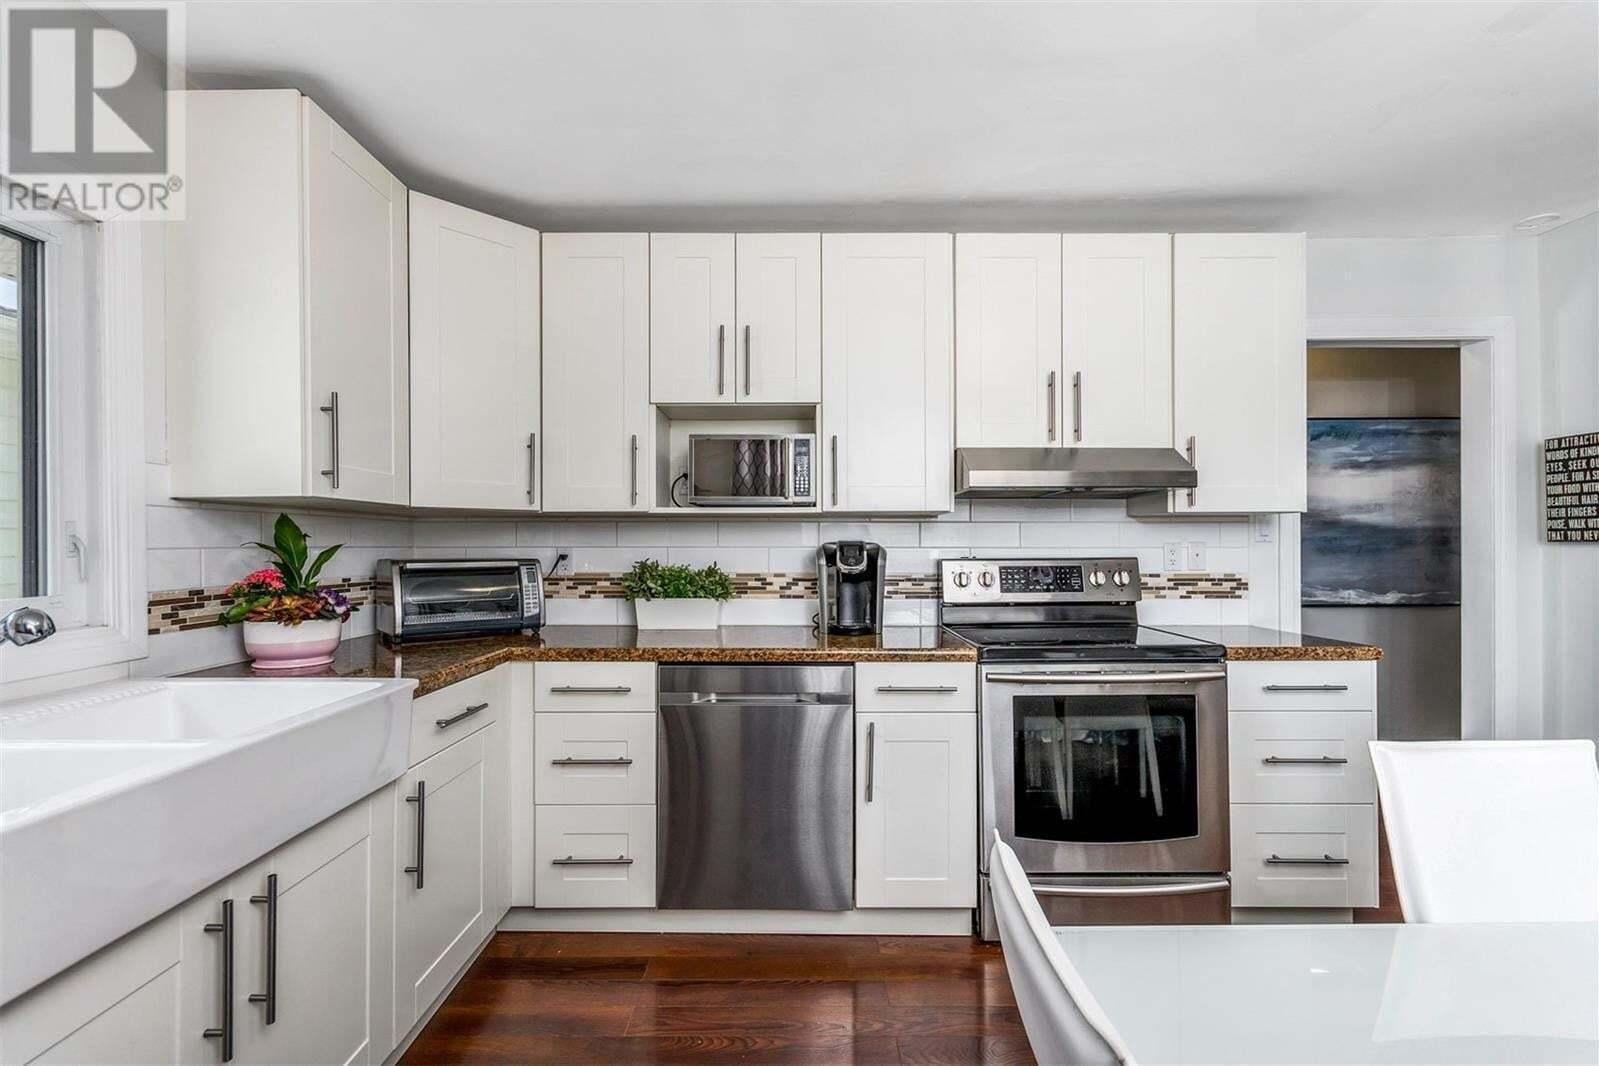 House for sale at 2708 Montreal Cres Regina Saskatchewan - MLS: SK821287